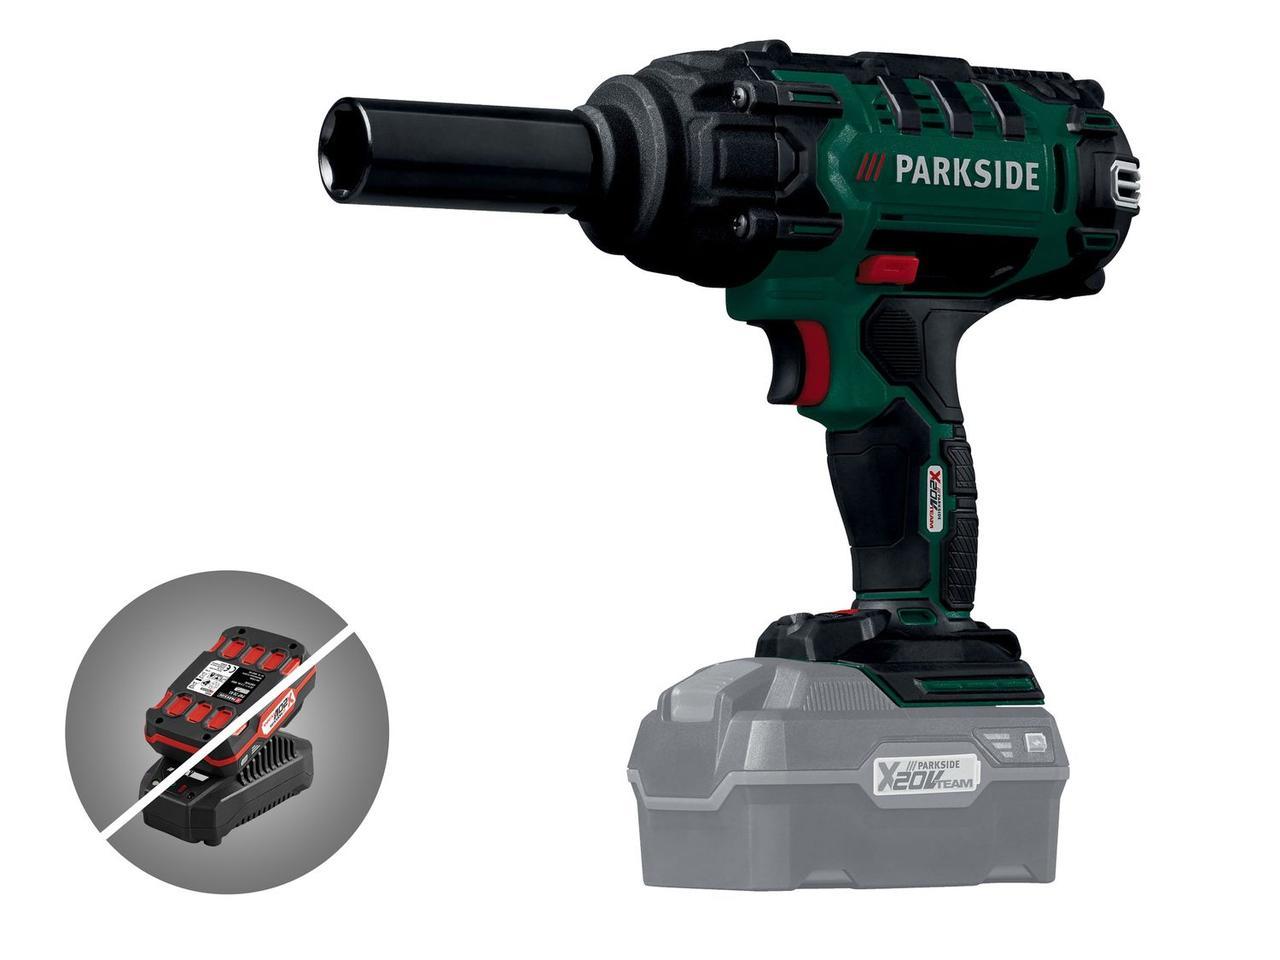 Аккумуляторный ударный гайковёрт PARKSIDE PASSK 20-Li A1 (Без аккумулятора / без зарядного устройства)